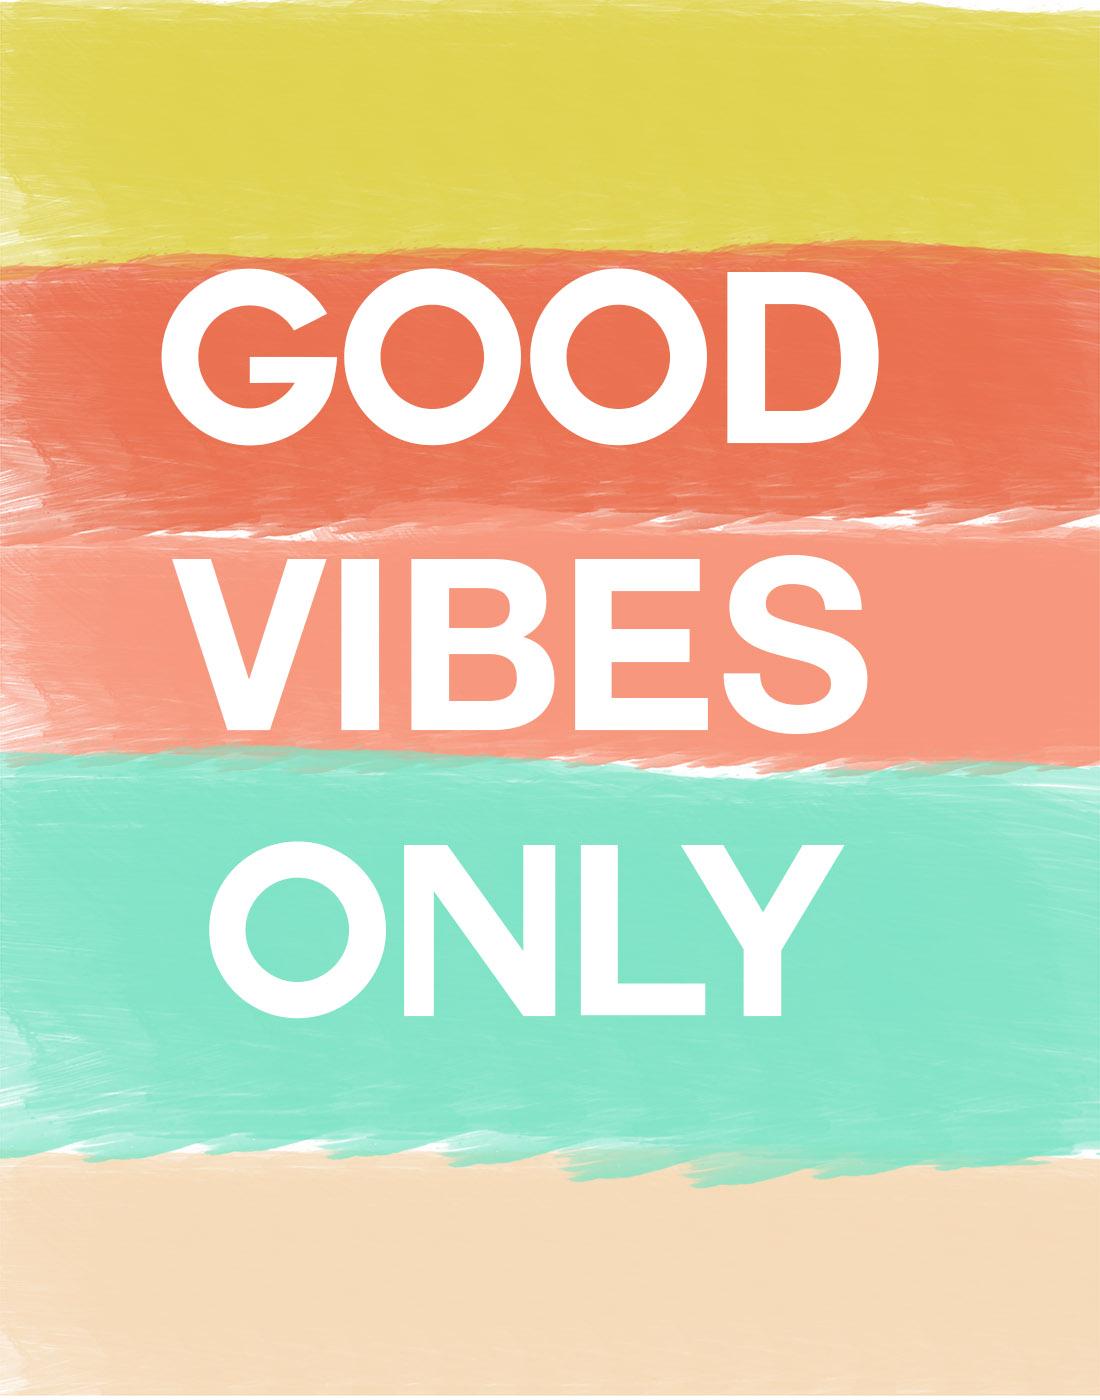 Positive Vibes Quotes Wallpaper Good Vibes Only Je Suis Bonne